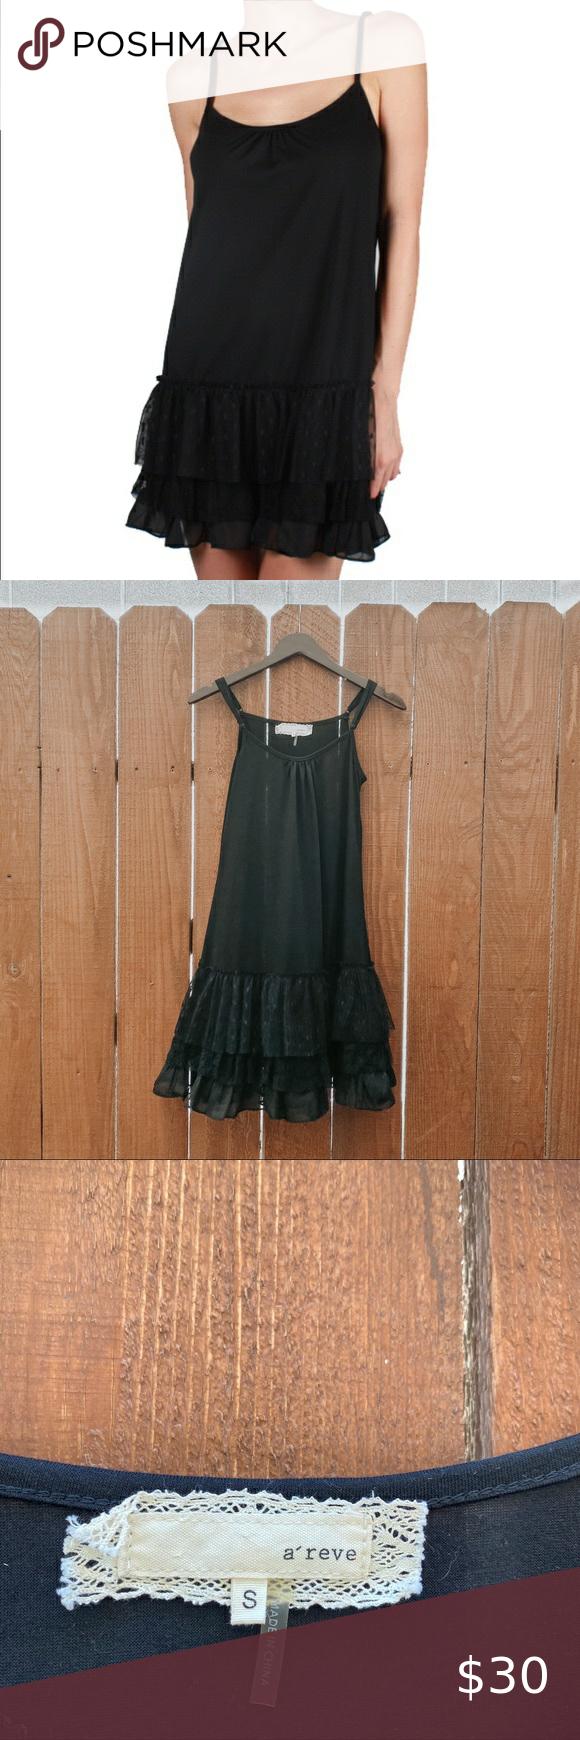 Anthro A Reve Black Slip Dress With Ruffle Bottom In 2020 Black Slip Dress Slip Dress Black Slip Ons [ 1740 x 580 Pixel ]